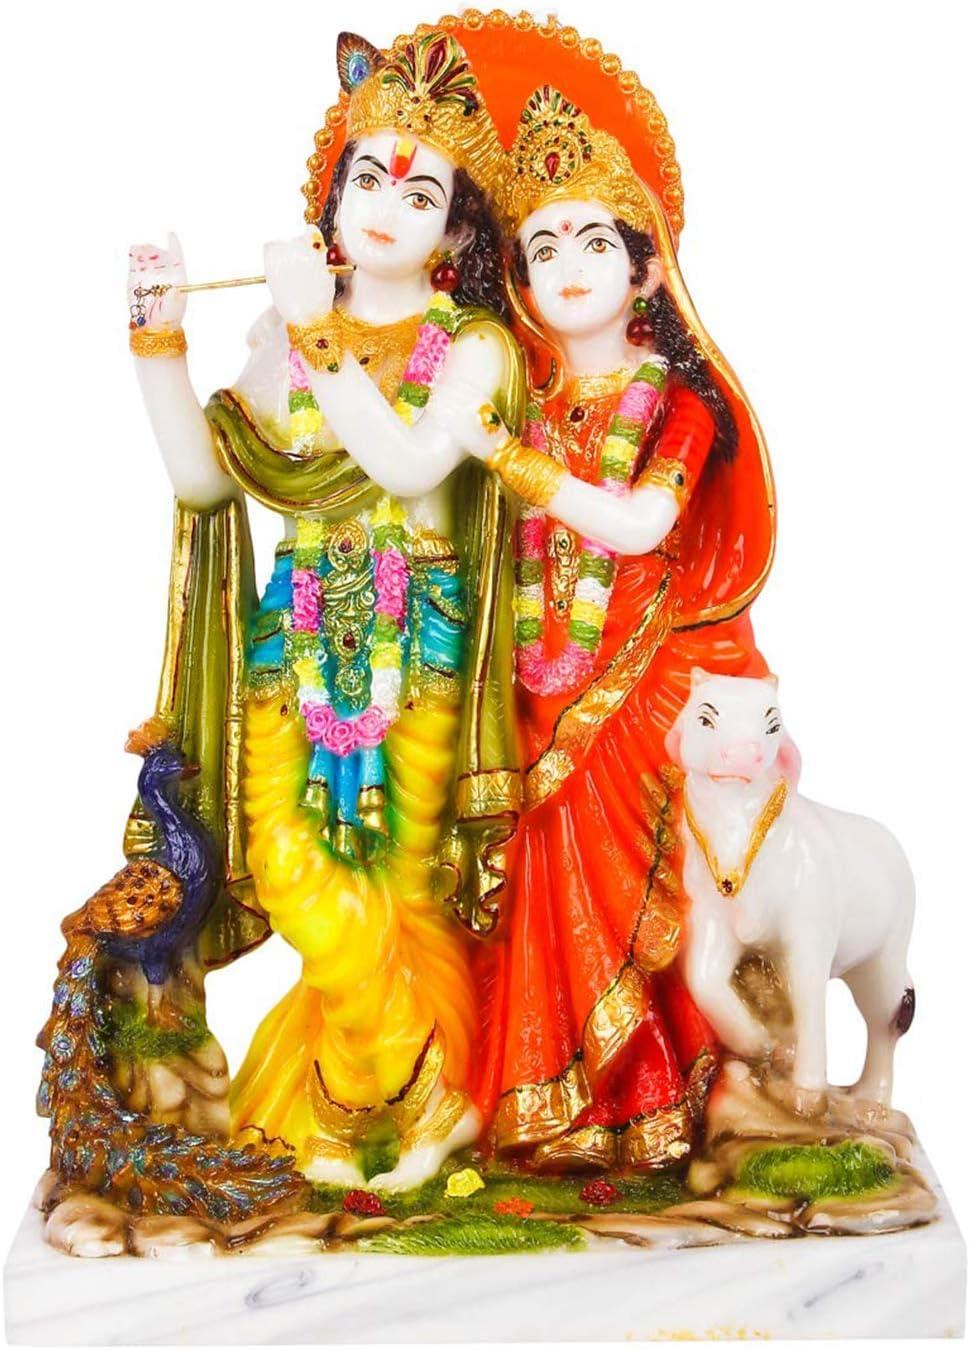 Sharvgun Radha Krishna Marble Idols murti for Pooja Room Idols Home Decor Indian Meditation Temple Mandir Puja Items